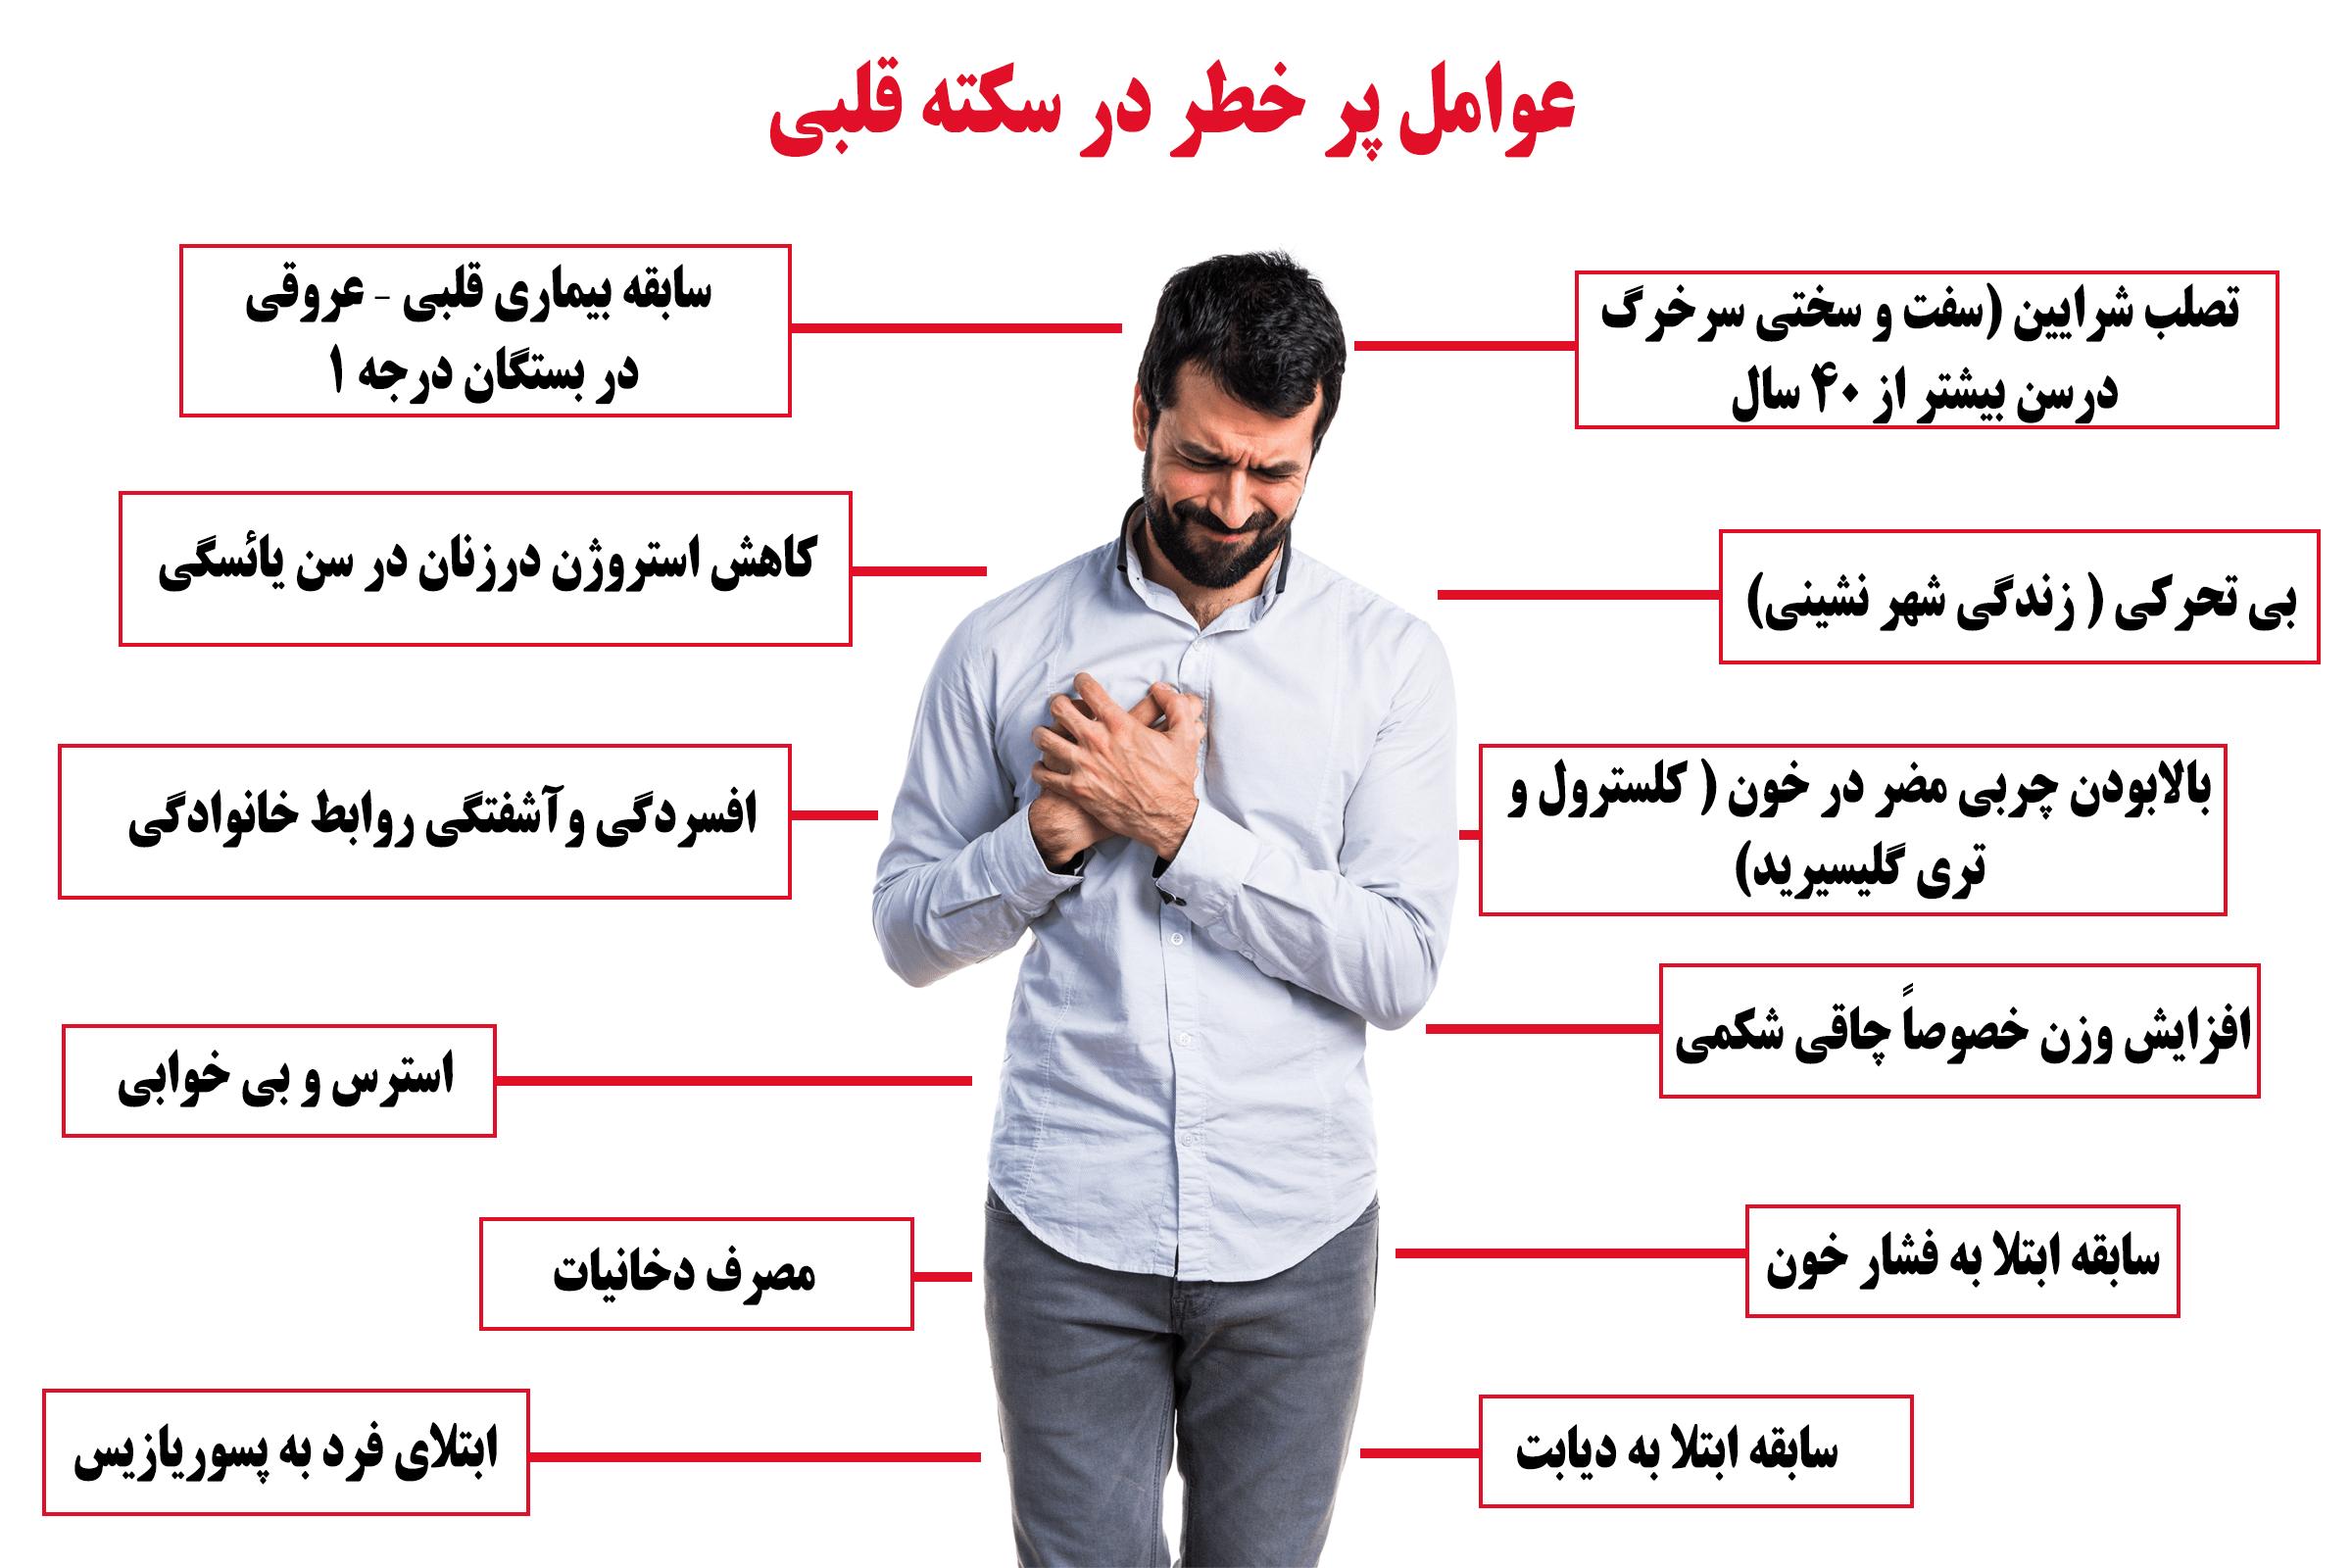 عوامل پرخطر سکته قلبی